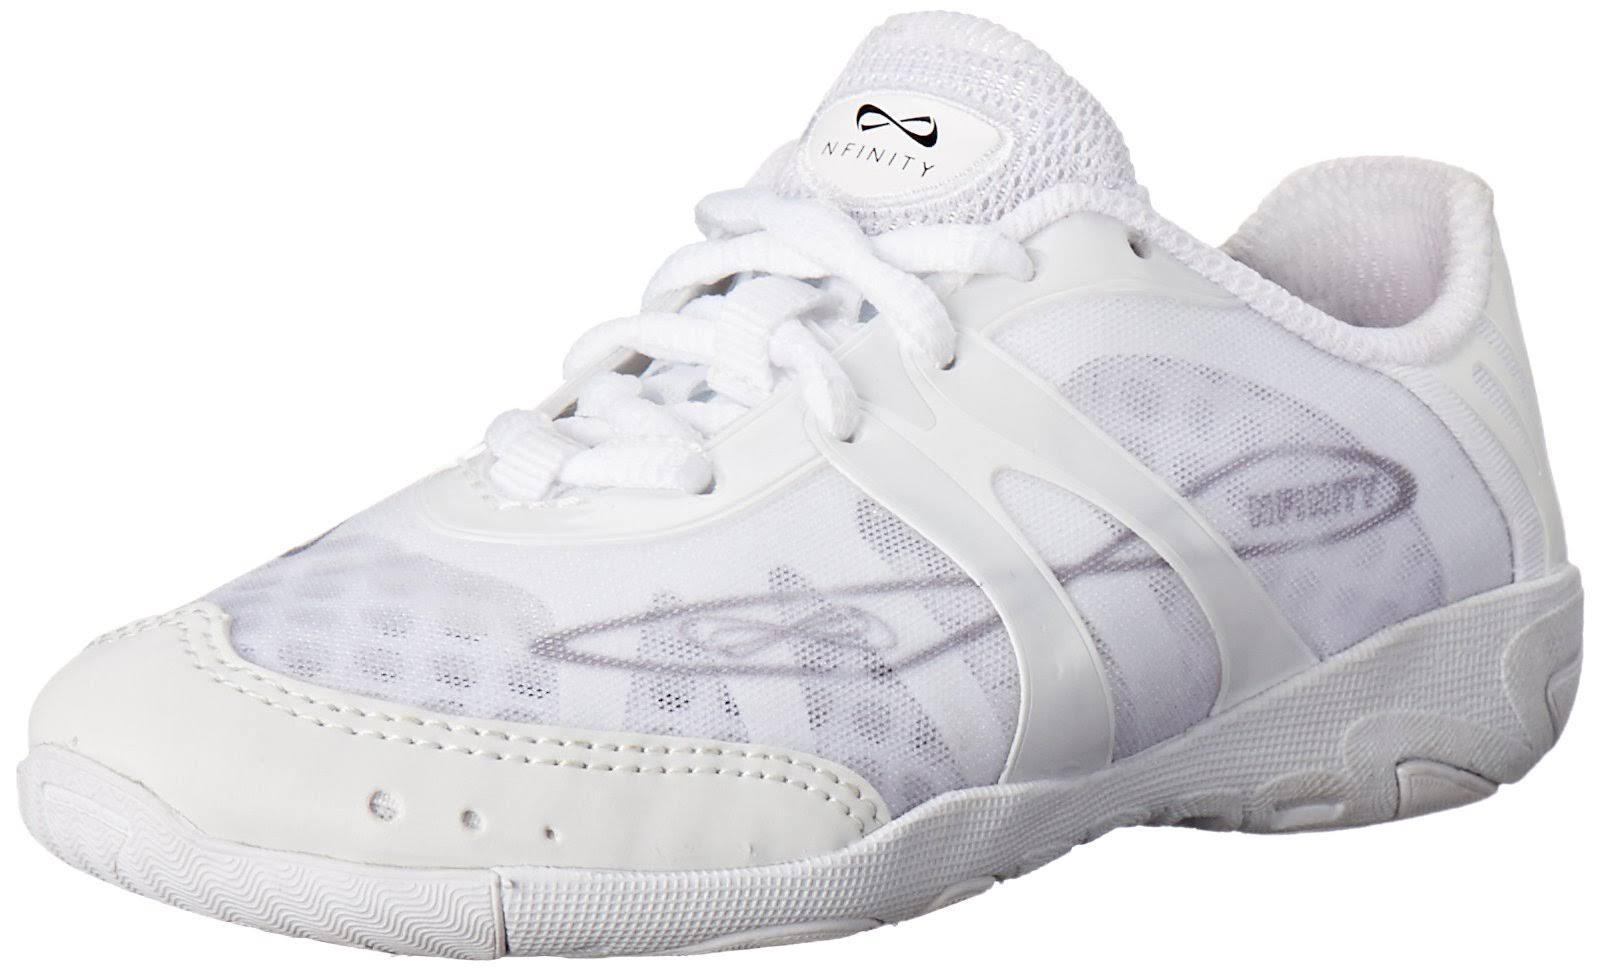 Size Girls Youth Shoes {vengeance} Cheerleading 4 Nfinity Dance xCHBwvPq